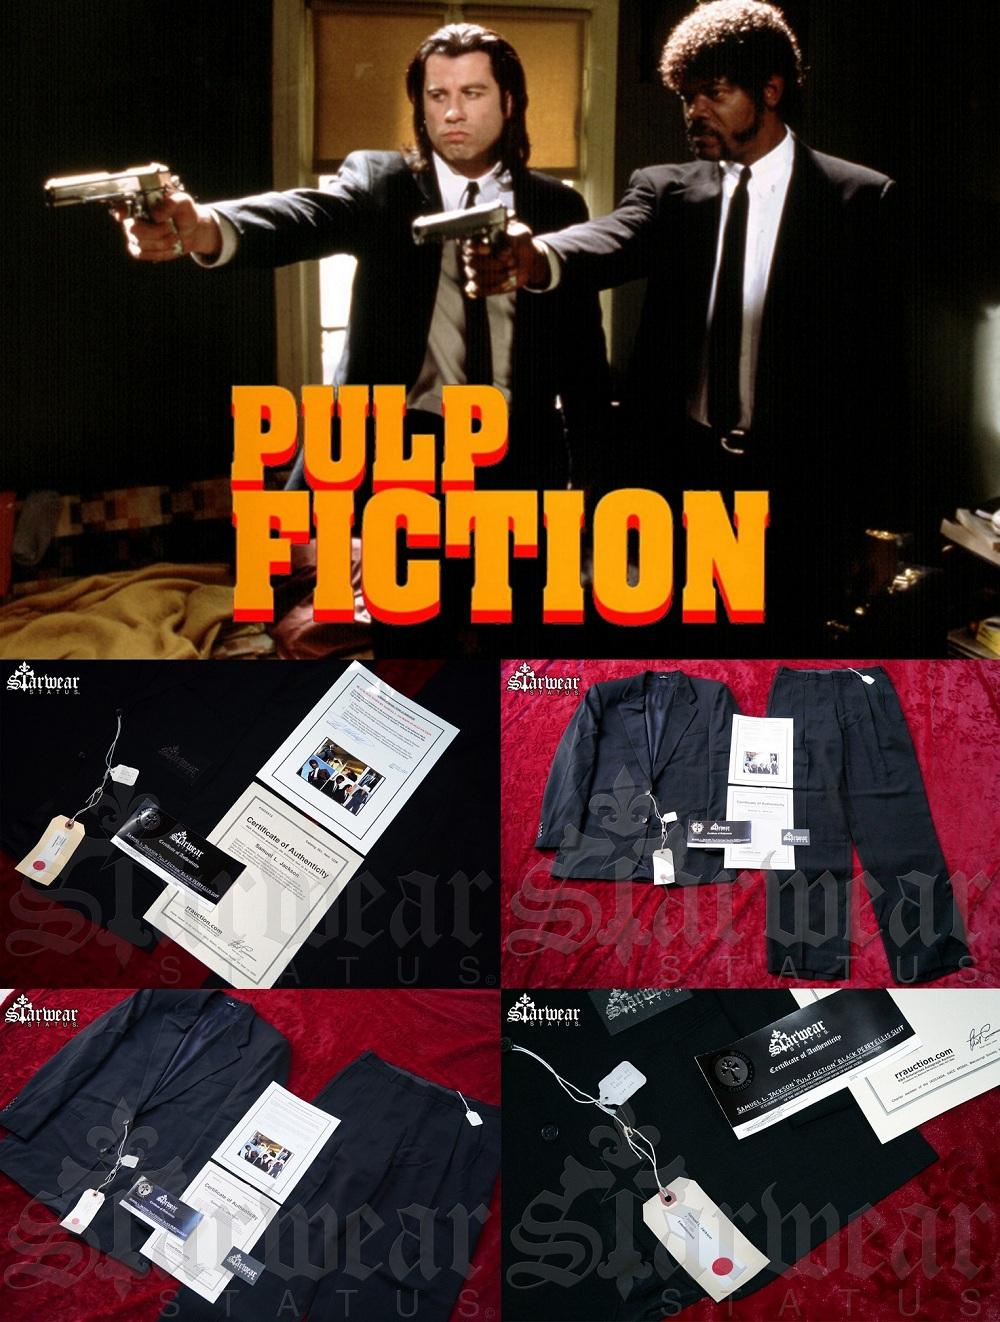 Samuel L Jackson Pulp Fiction Screen Worn Used Hero Movie Prop Suit W Full Documentation Holy Grail Starwear Status